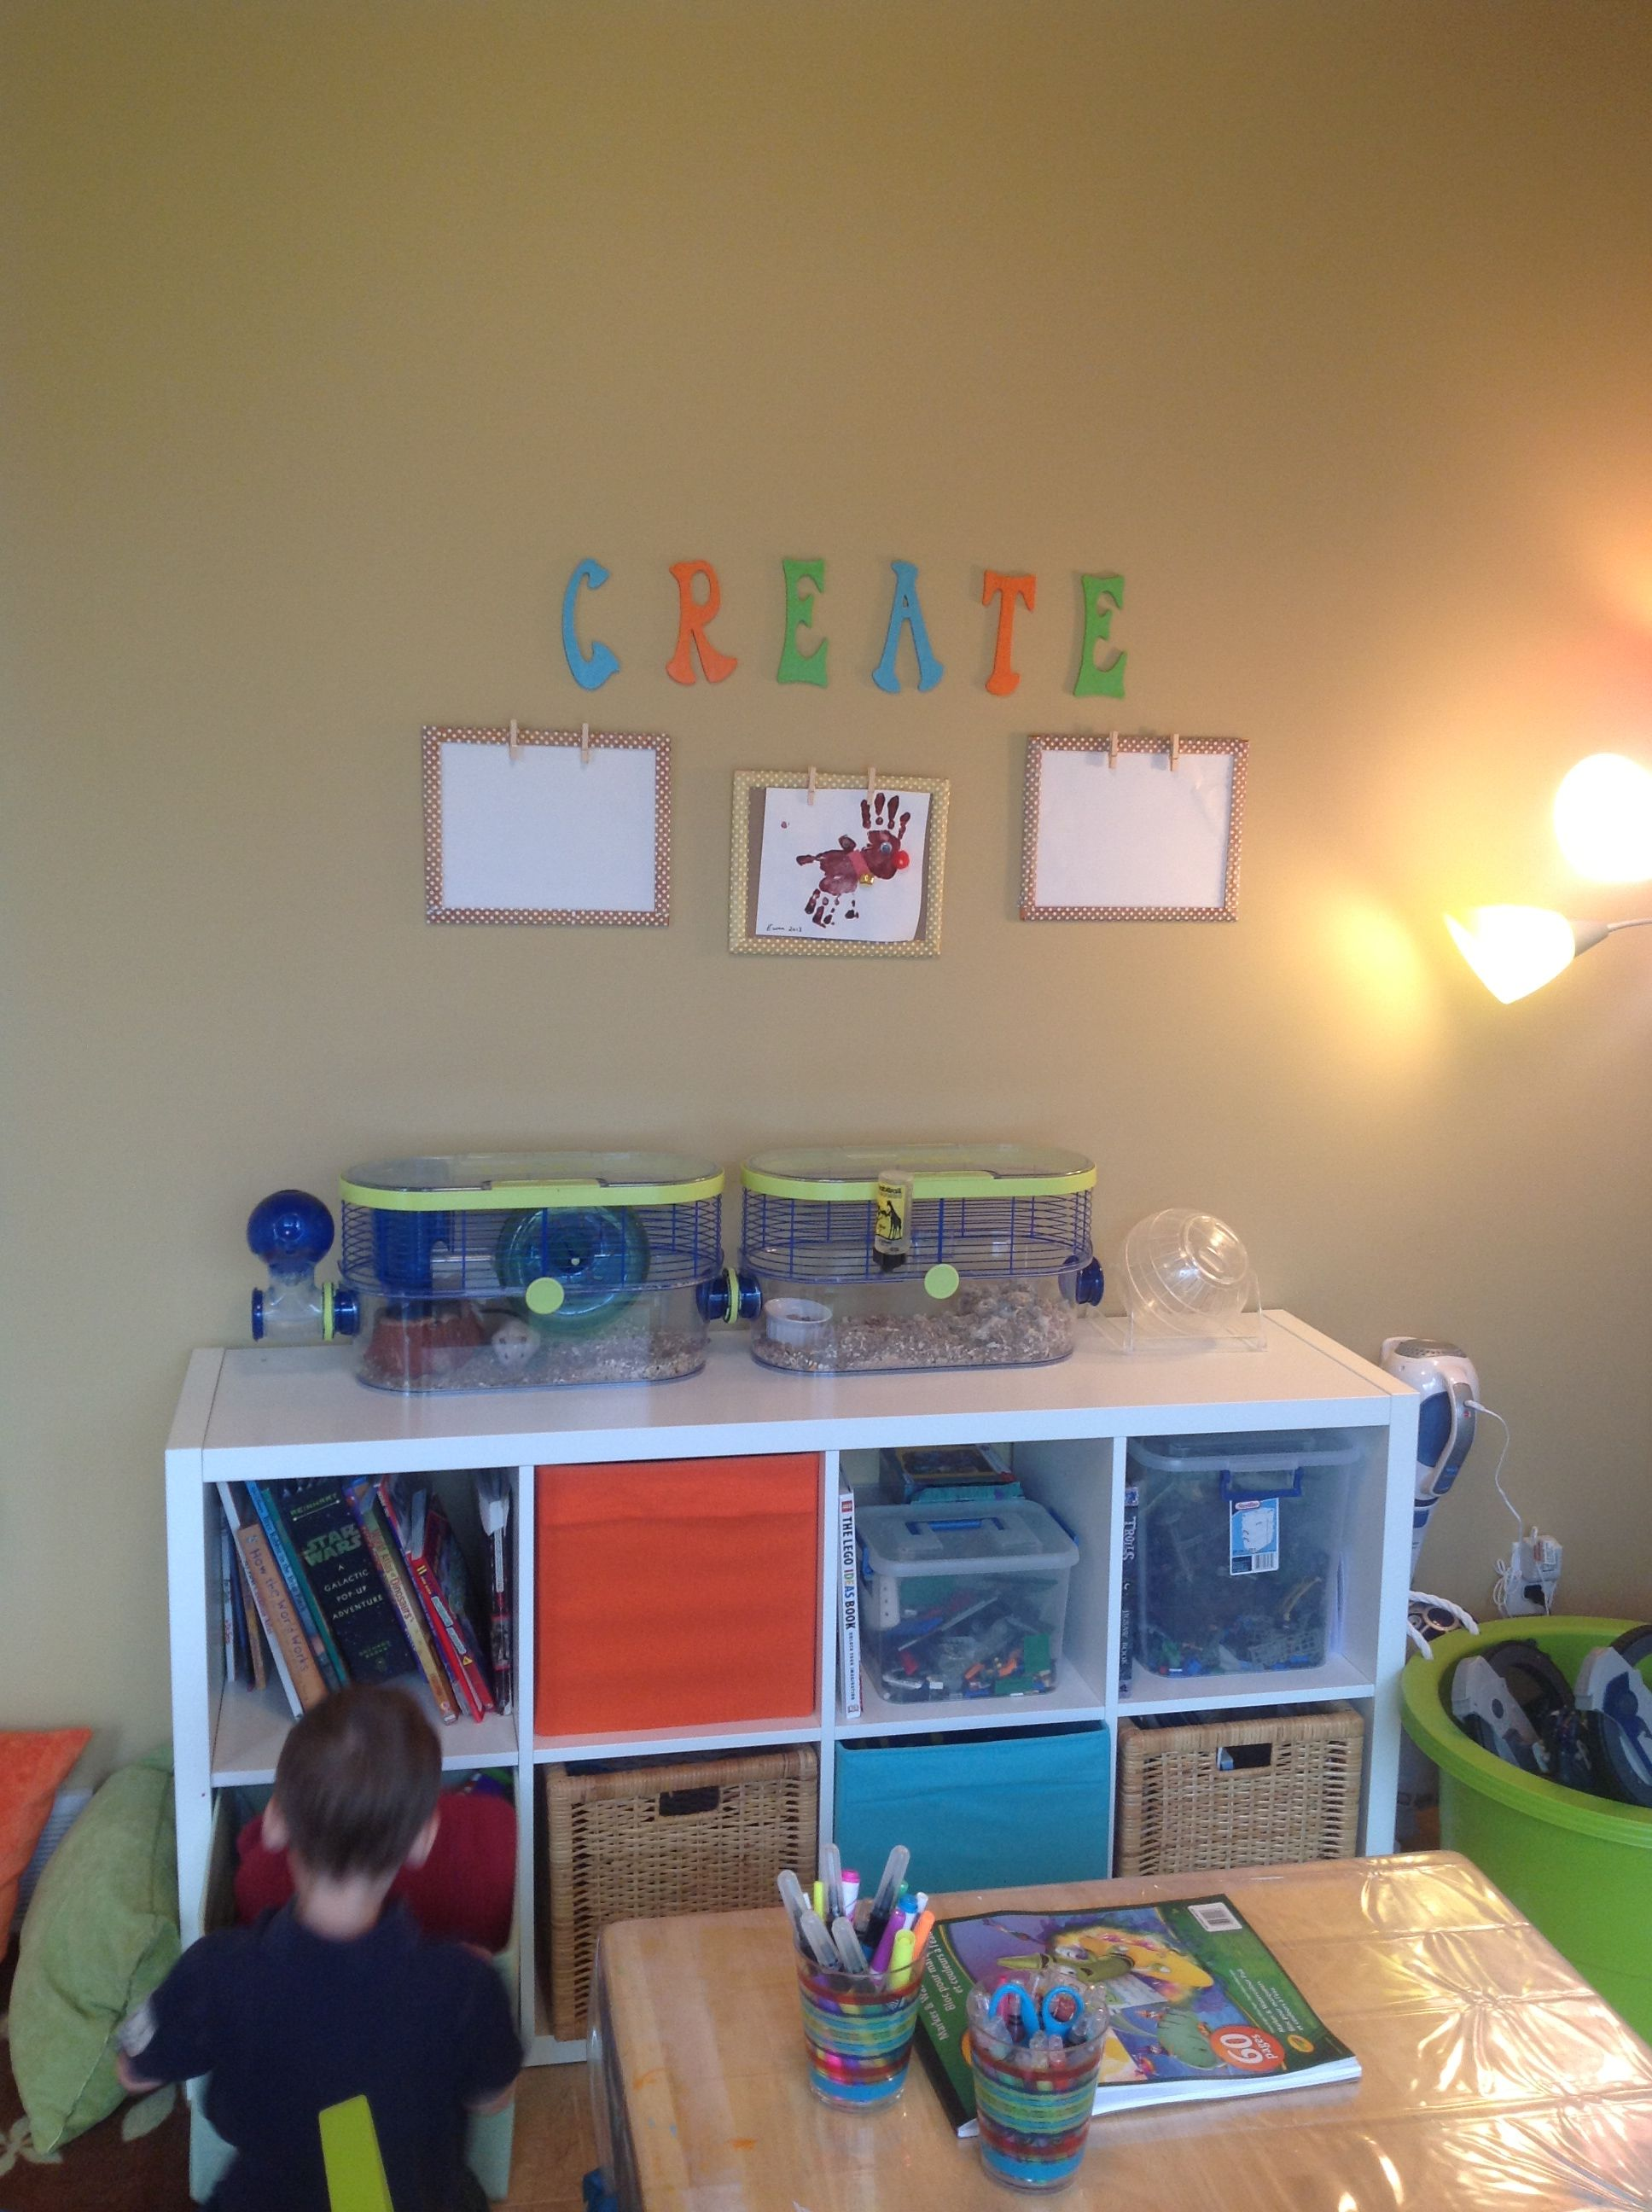 Play room Playroom, Home appliances, Box fan